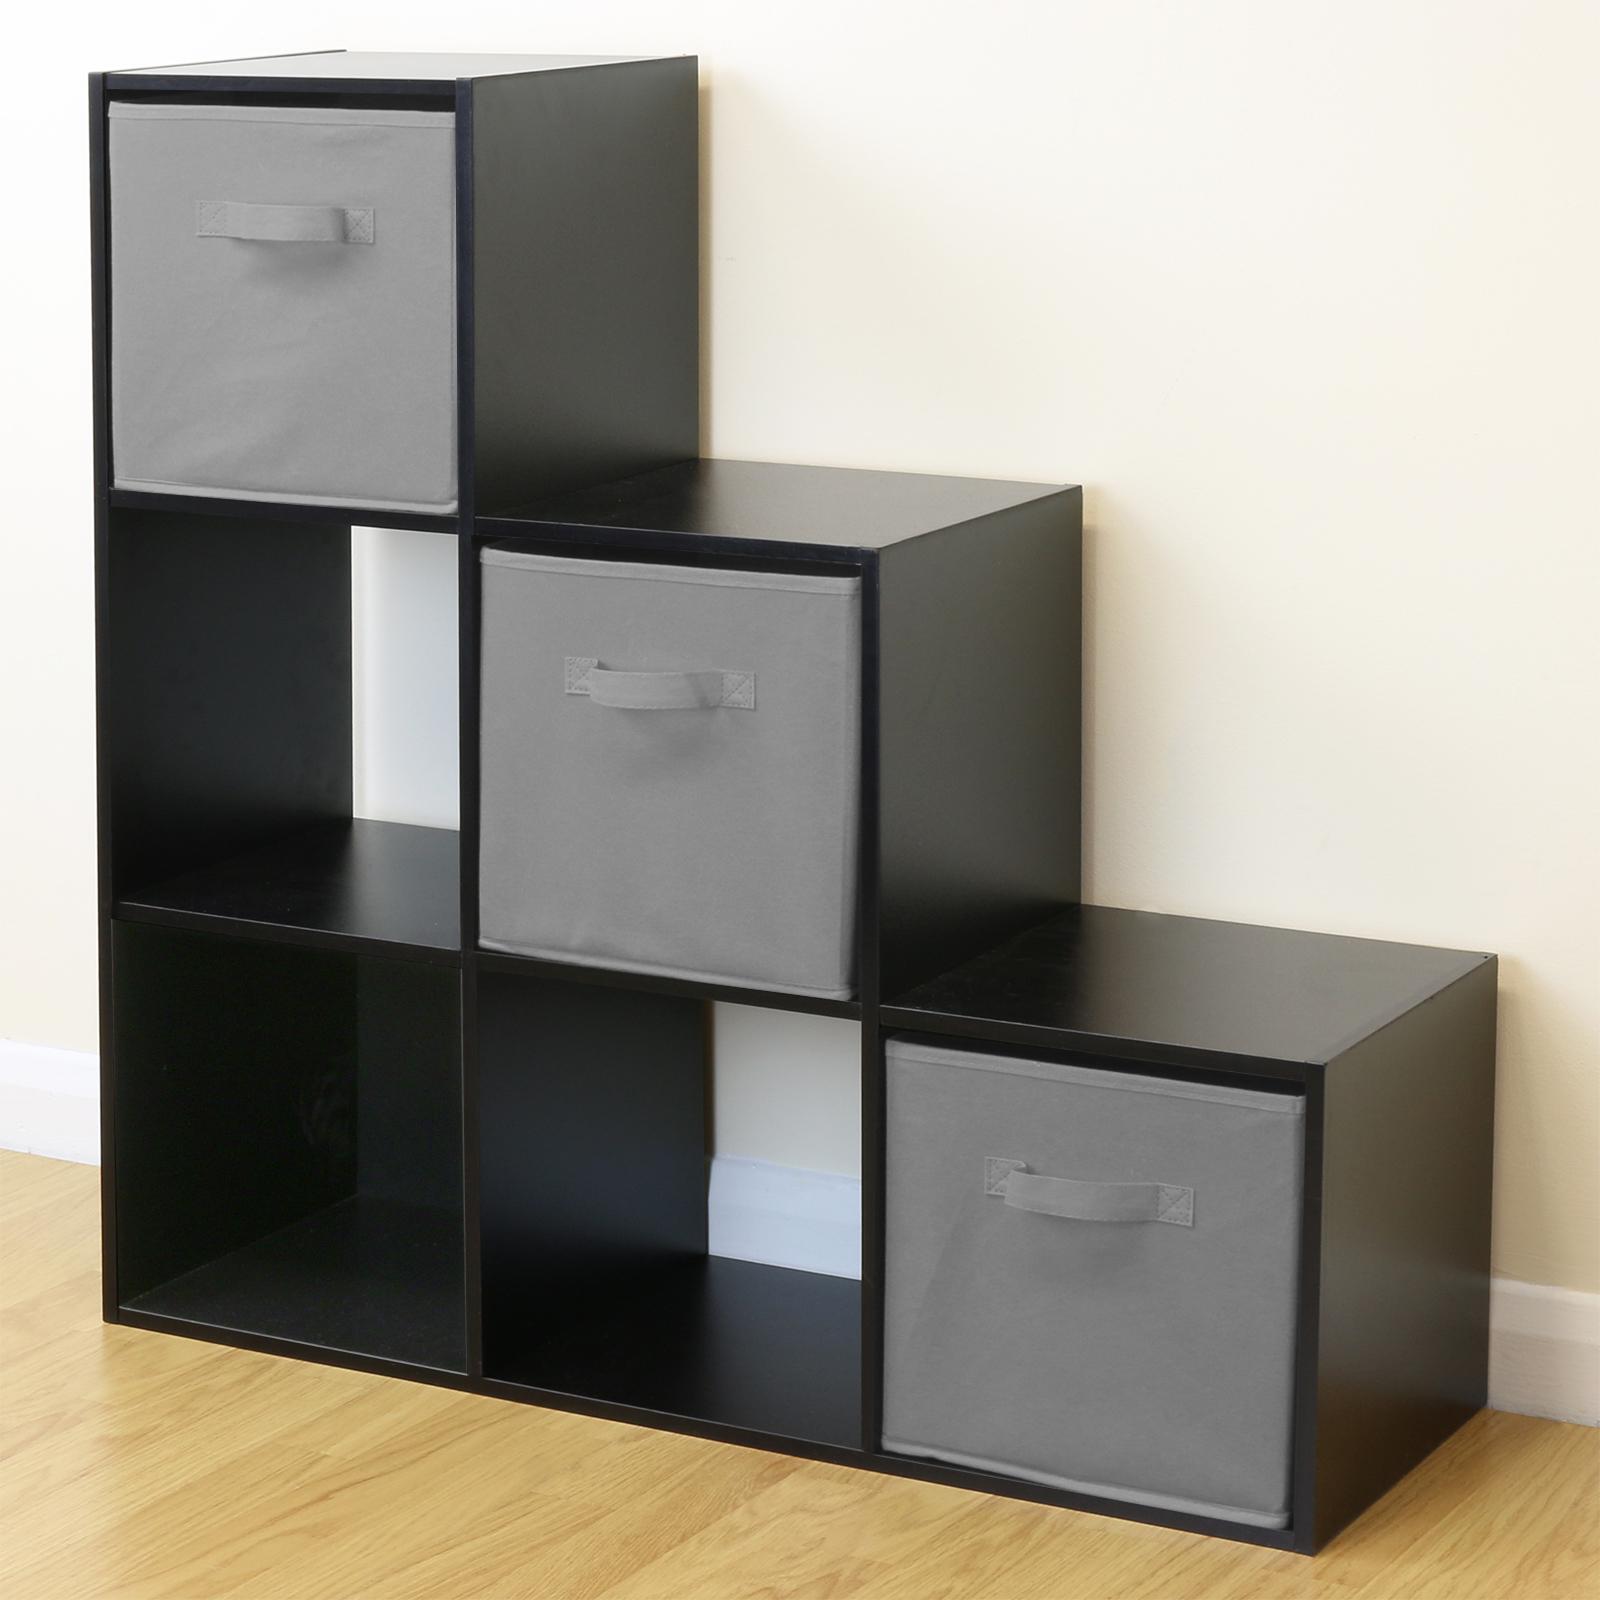 Kids Storage Cube Organizer Toy Box Kids Bedroom Furniture: Black 6 Cube Kids Toy/Games Storage Unit Girls/Boys